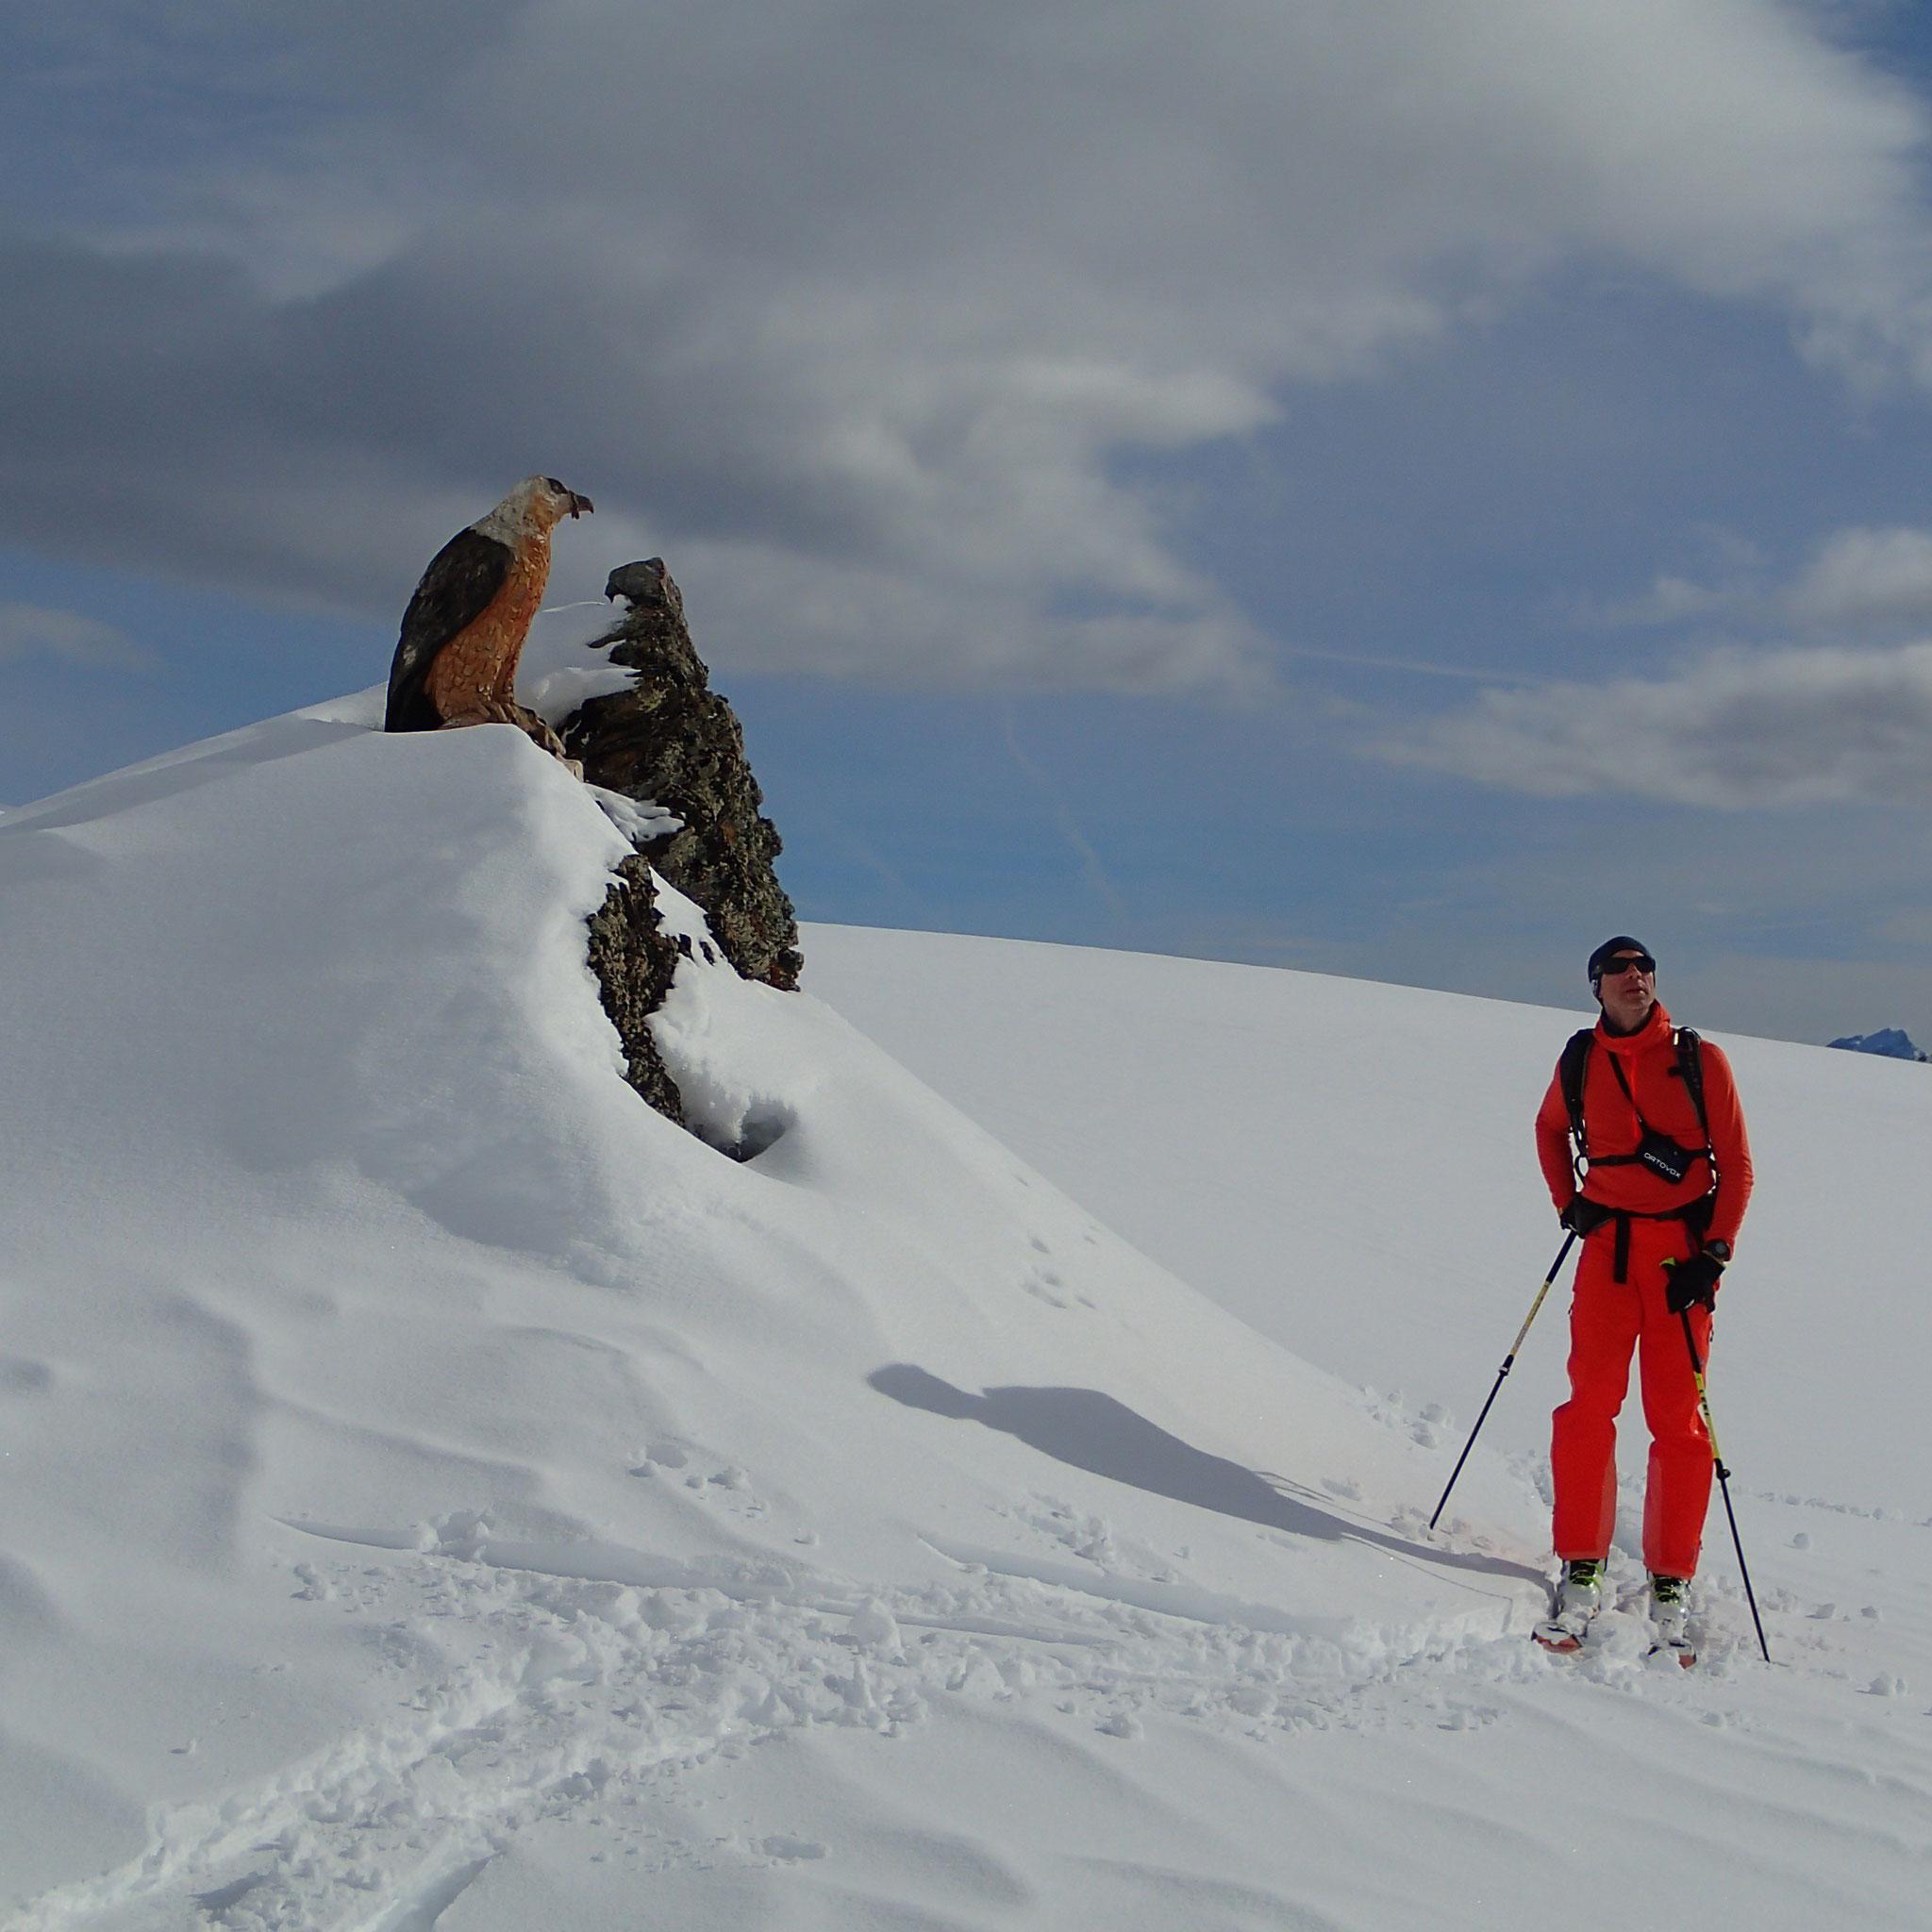 Rencontre avec le sentier alpin